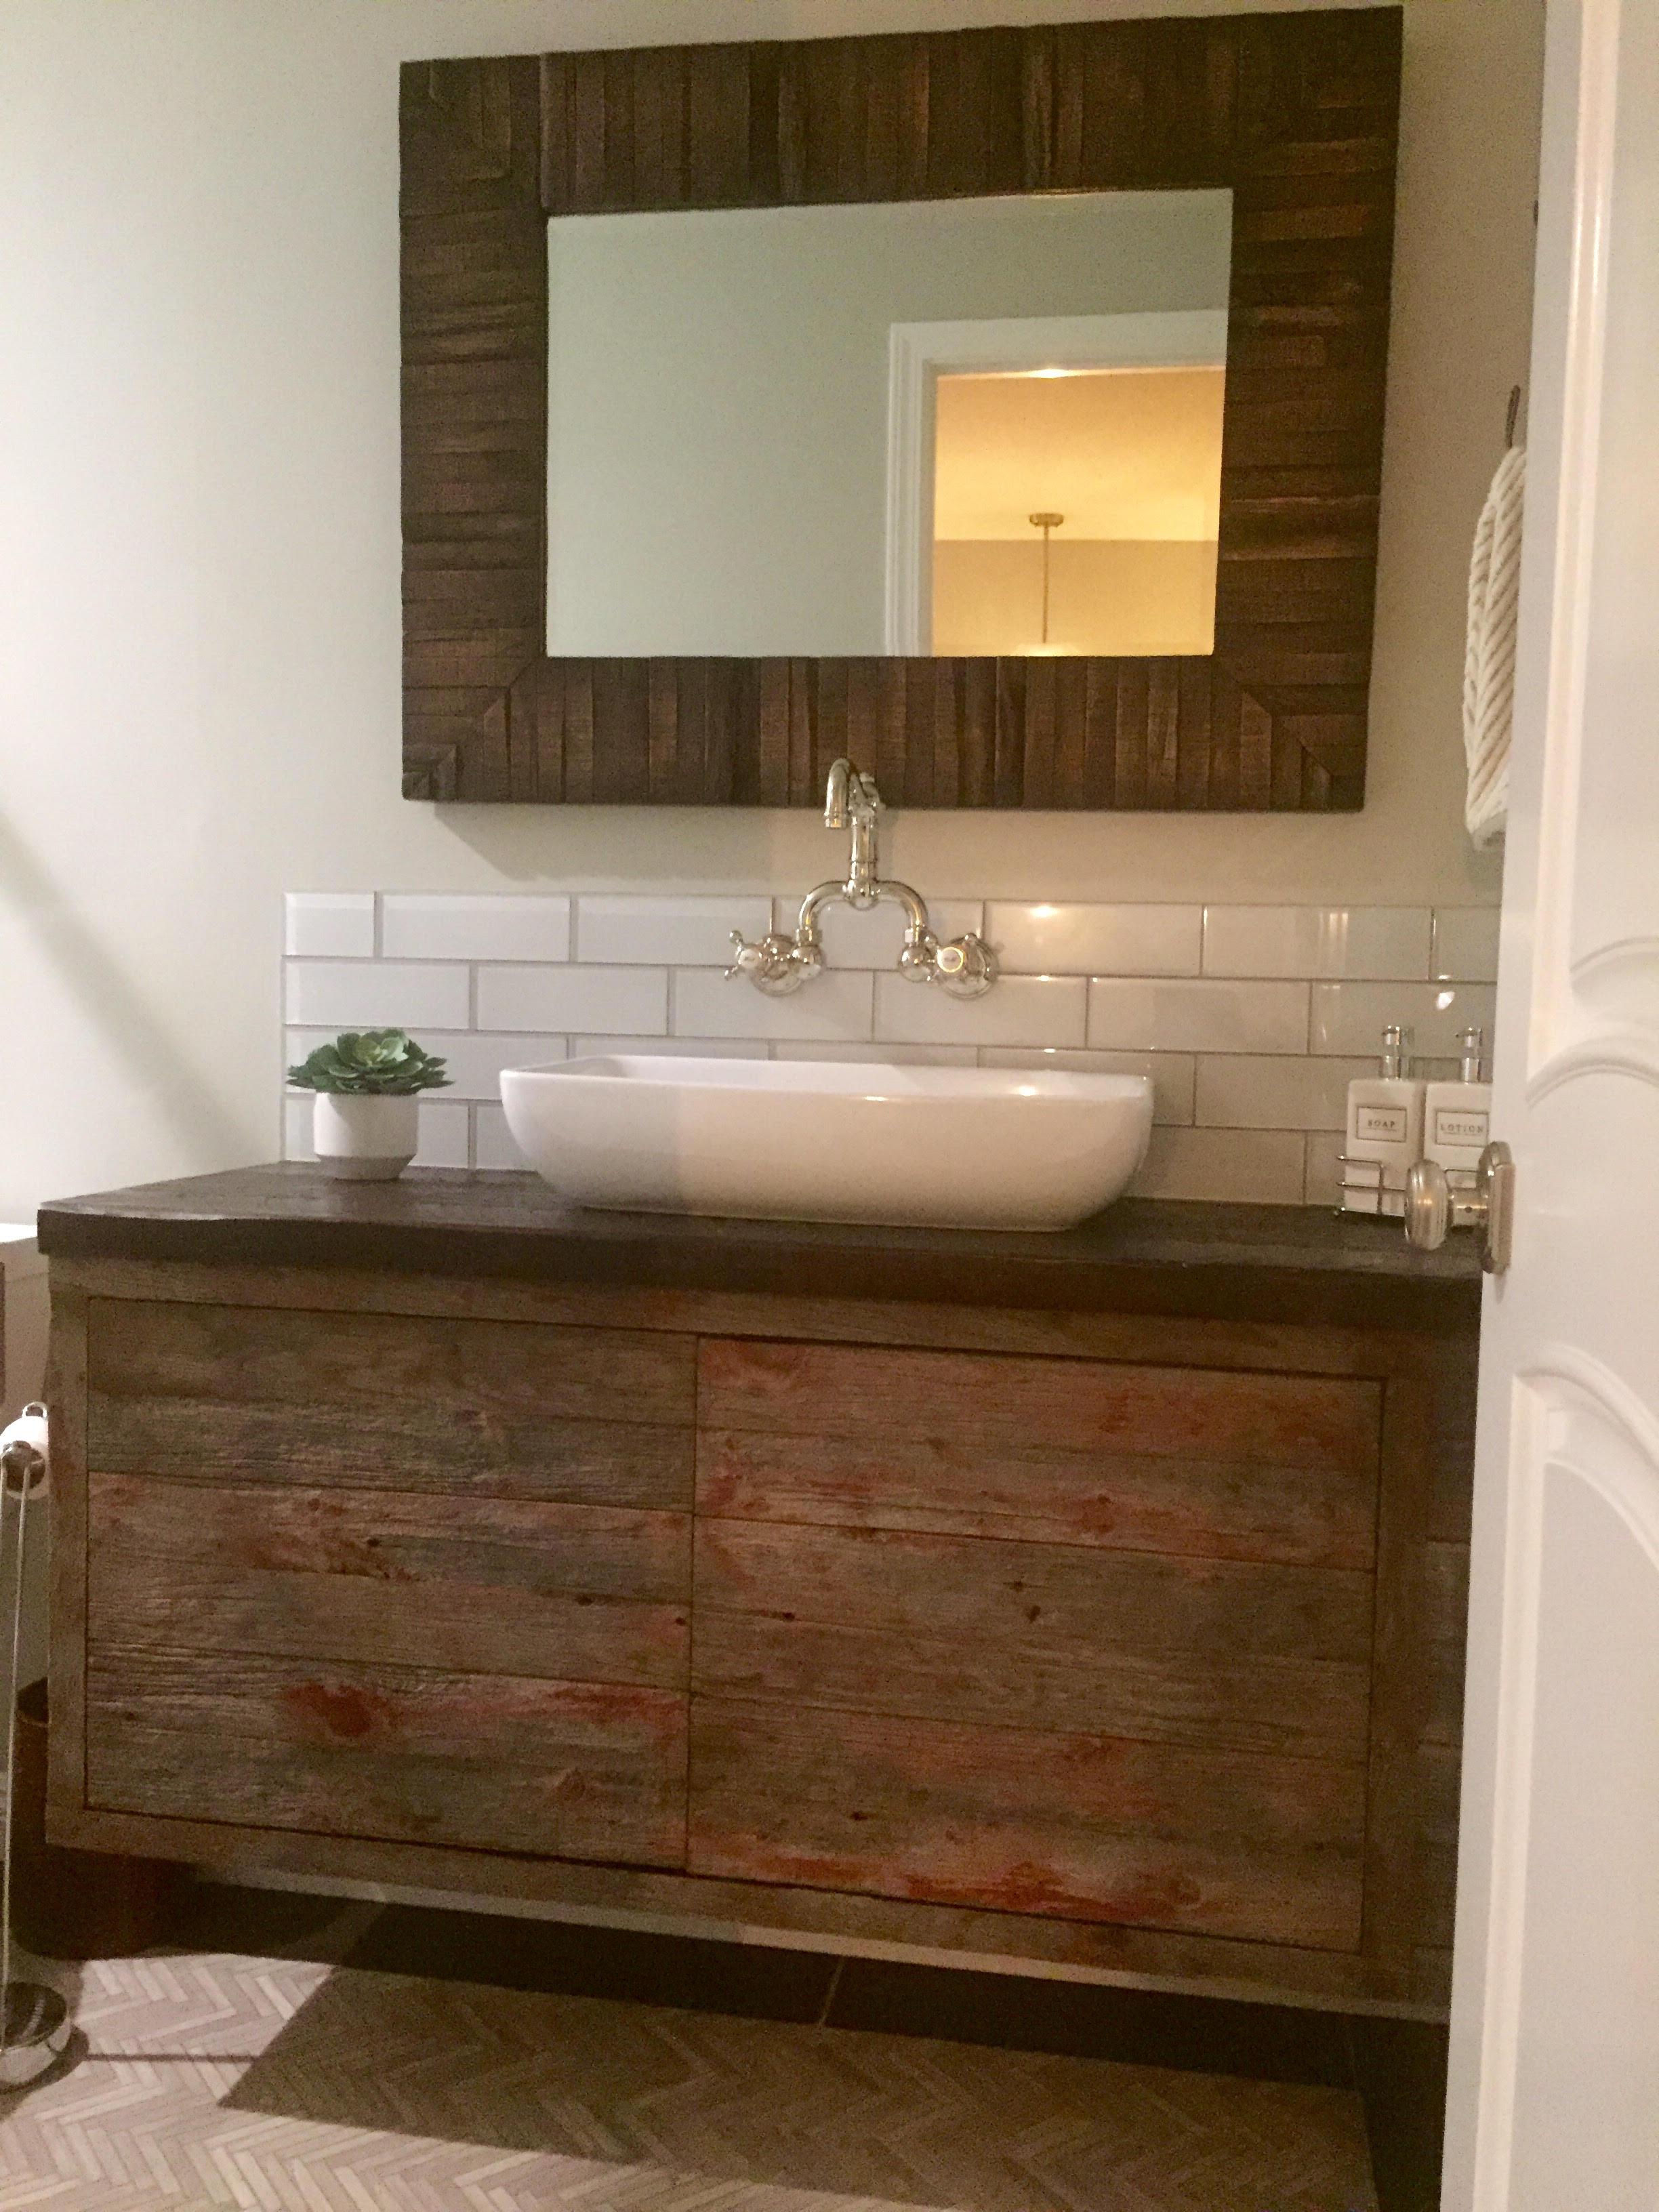 U S Reclaimedu S Reclaimedreclaimed Barn Wood Bathroom Vanity